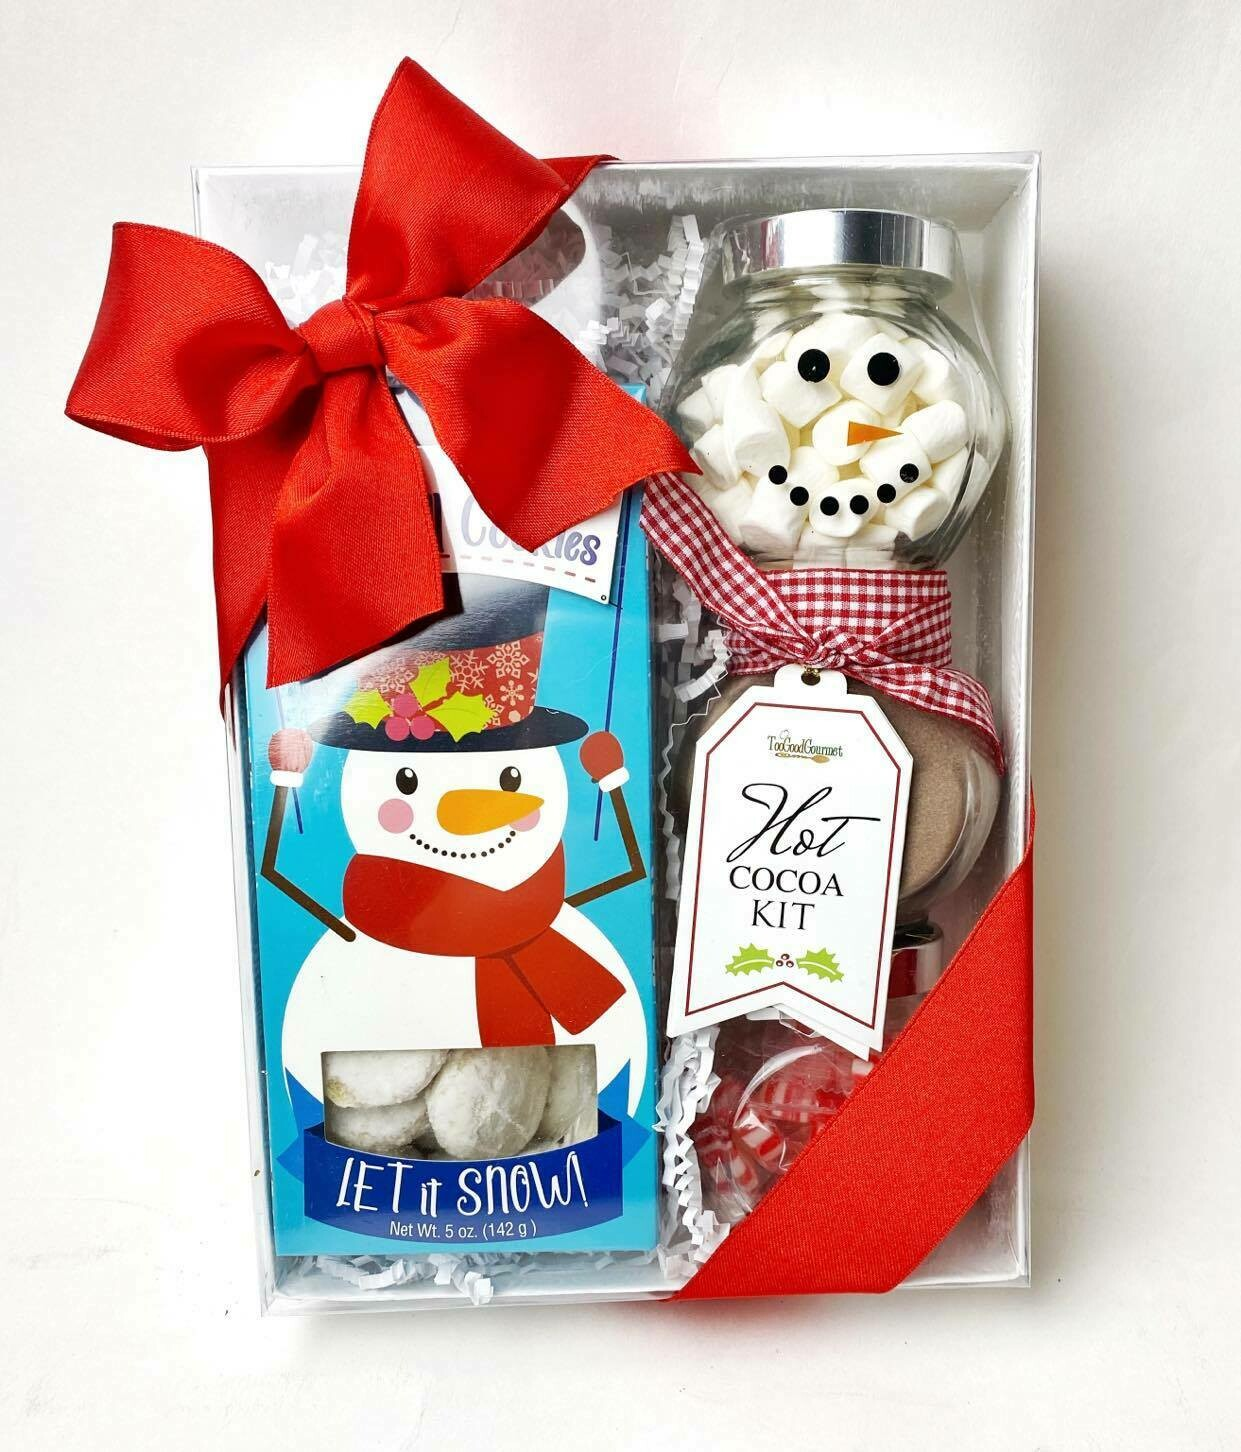 bestselling-gift-baskets